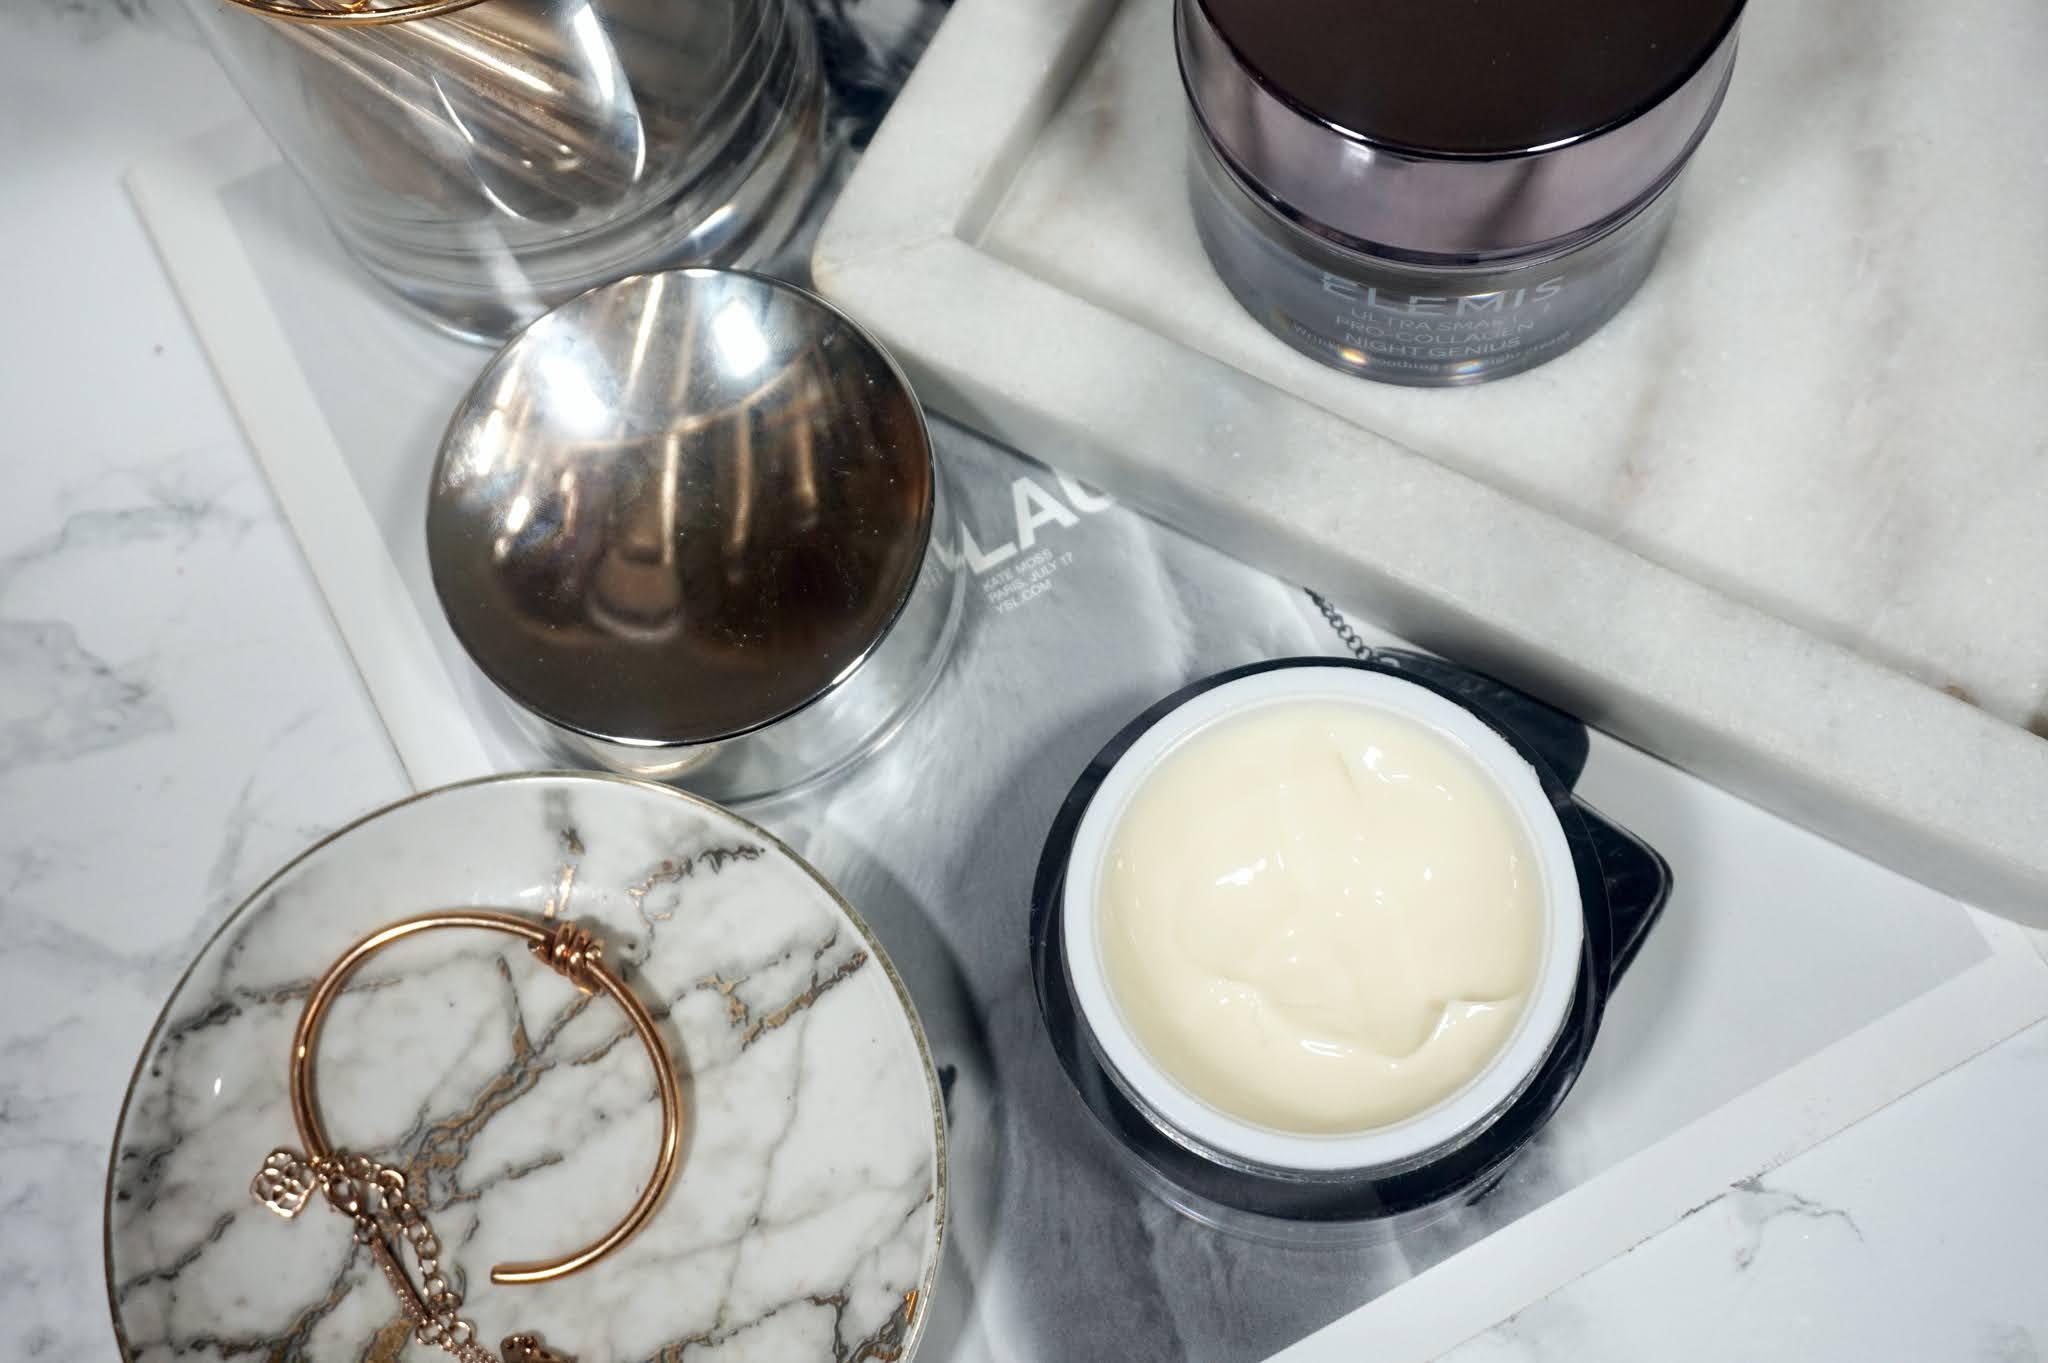 Elemis ULTRA SMART Pro-Collagen Enviro-Adapt Day Cream Review